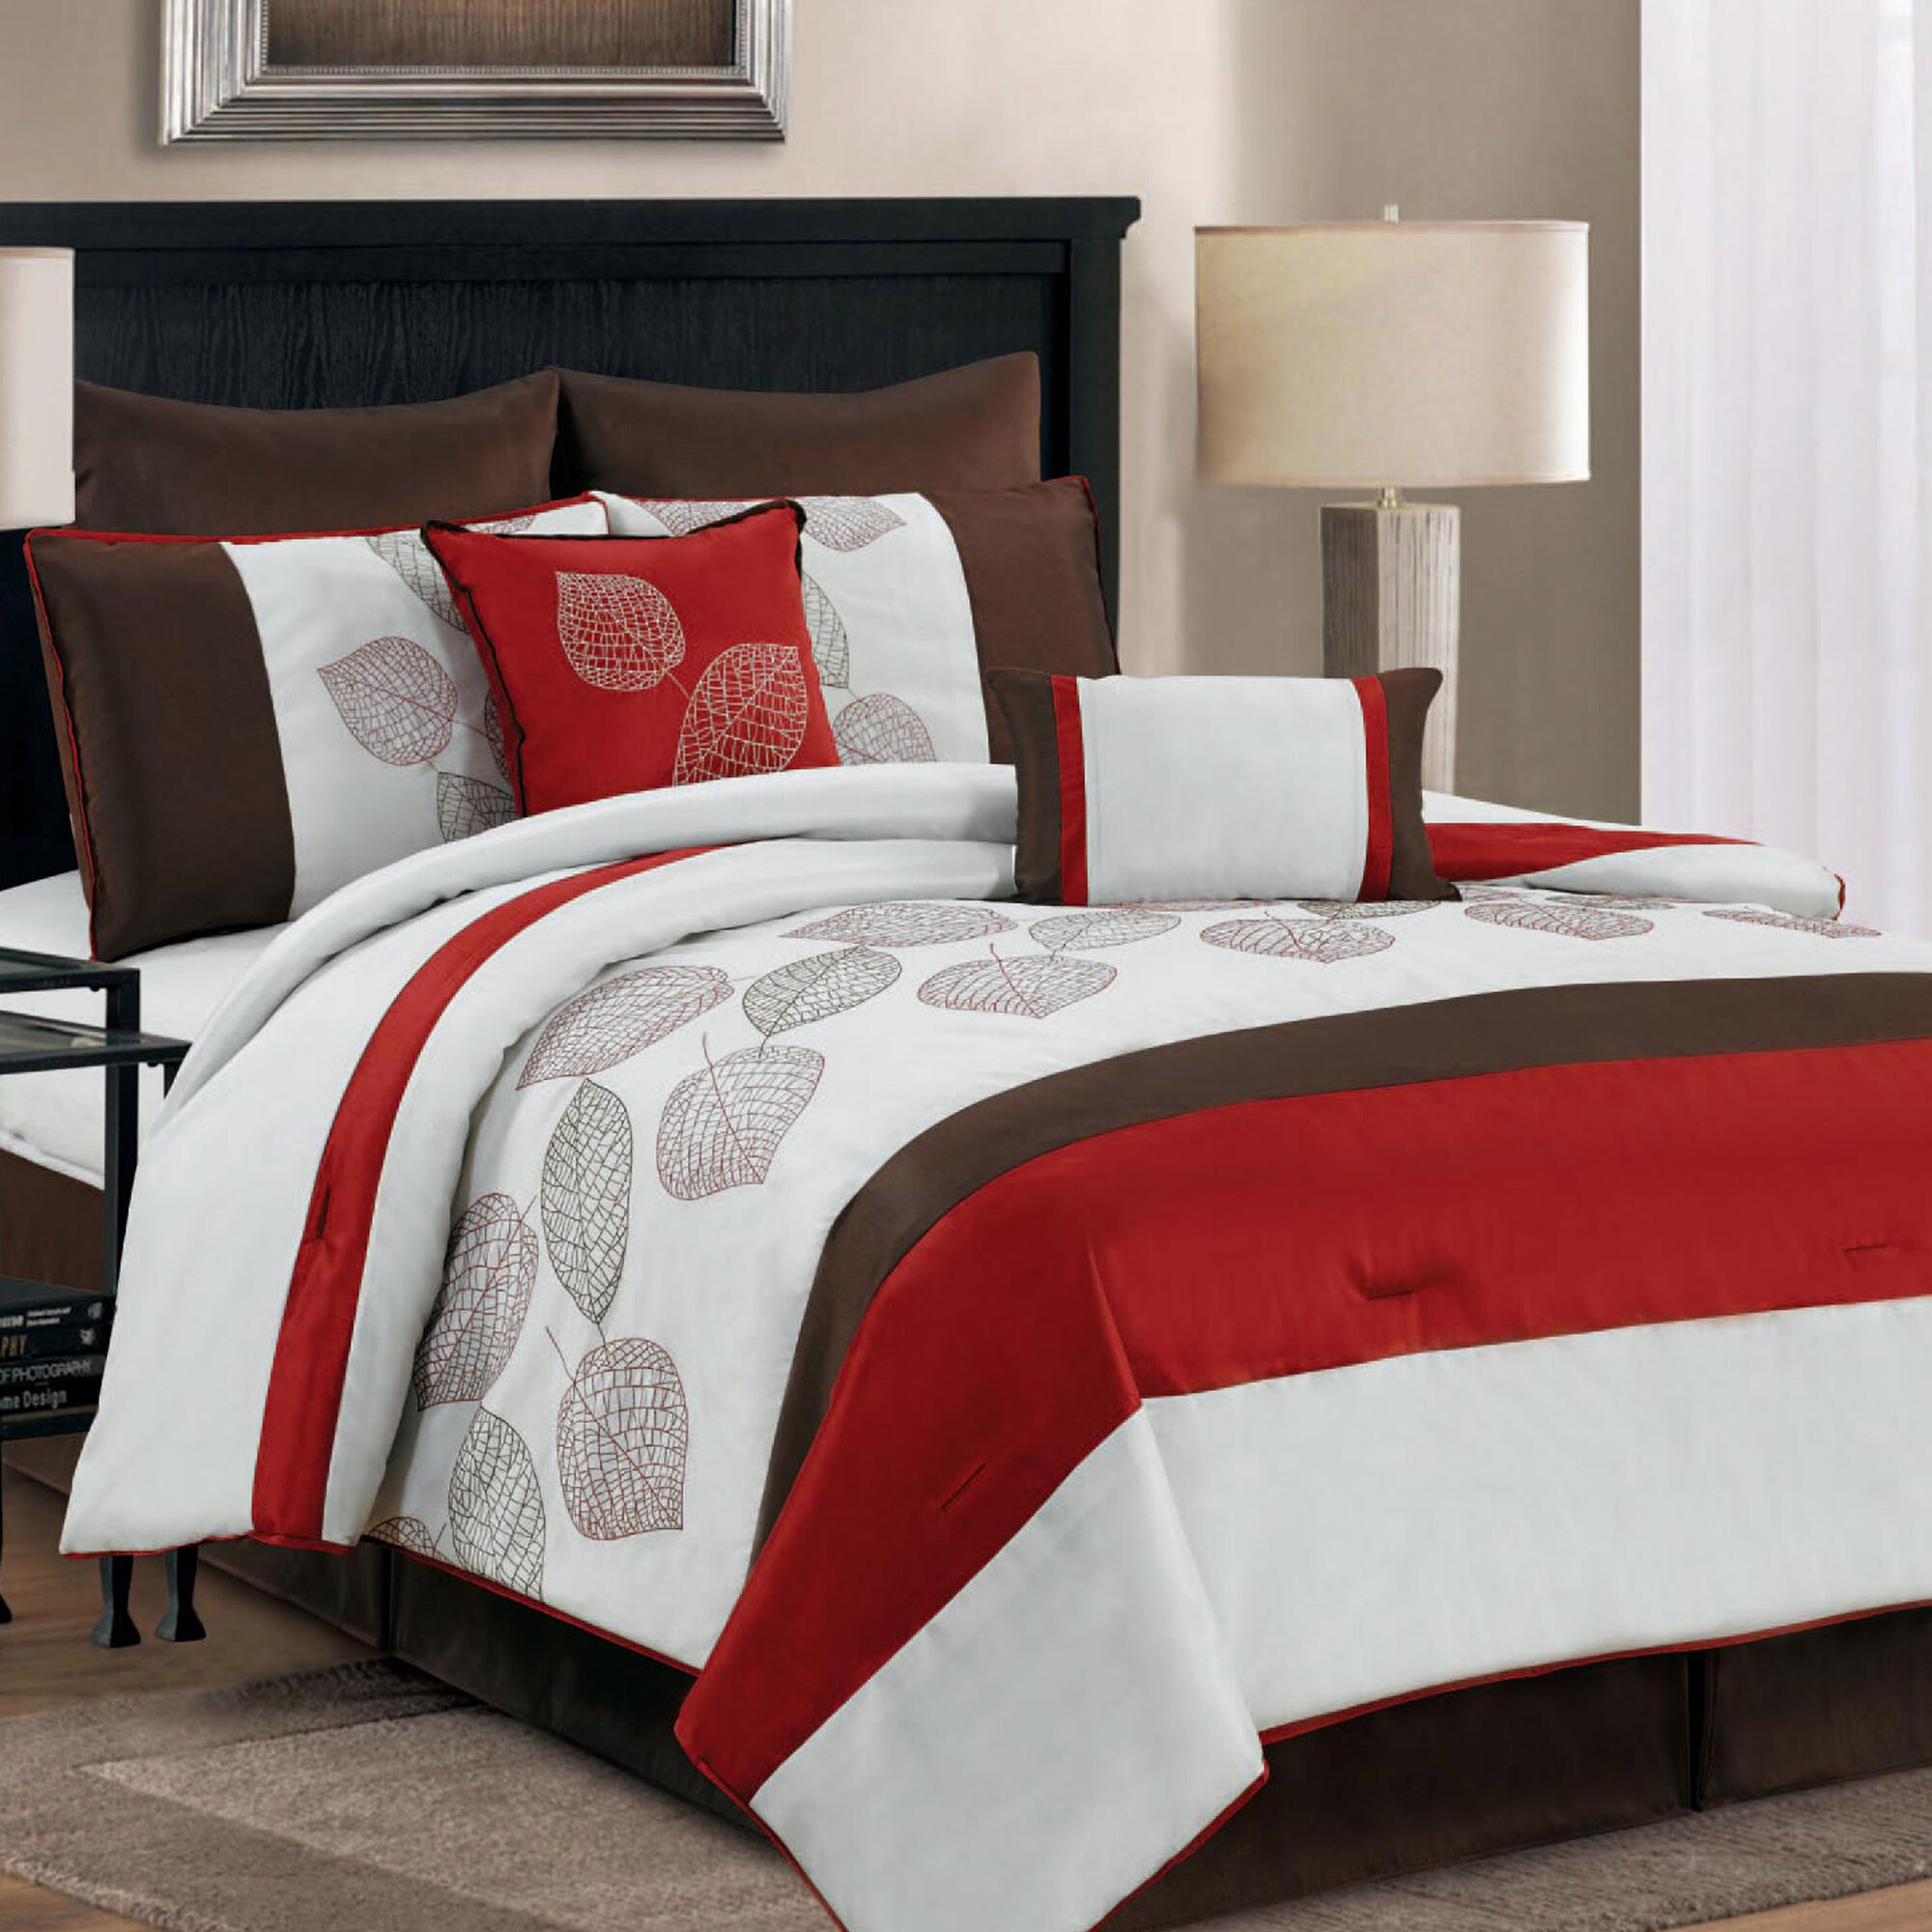 CHD HOME TEXTILE LLC Terrytown 8 Piece Comforter Set Size: Queen, Color: Red